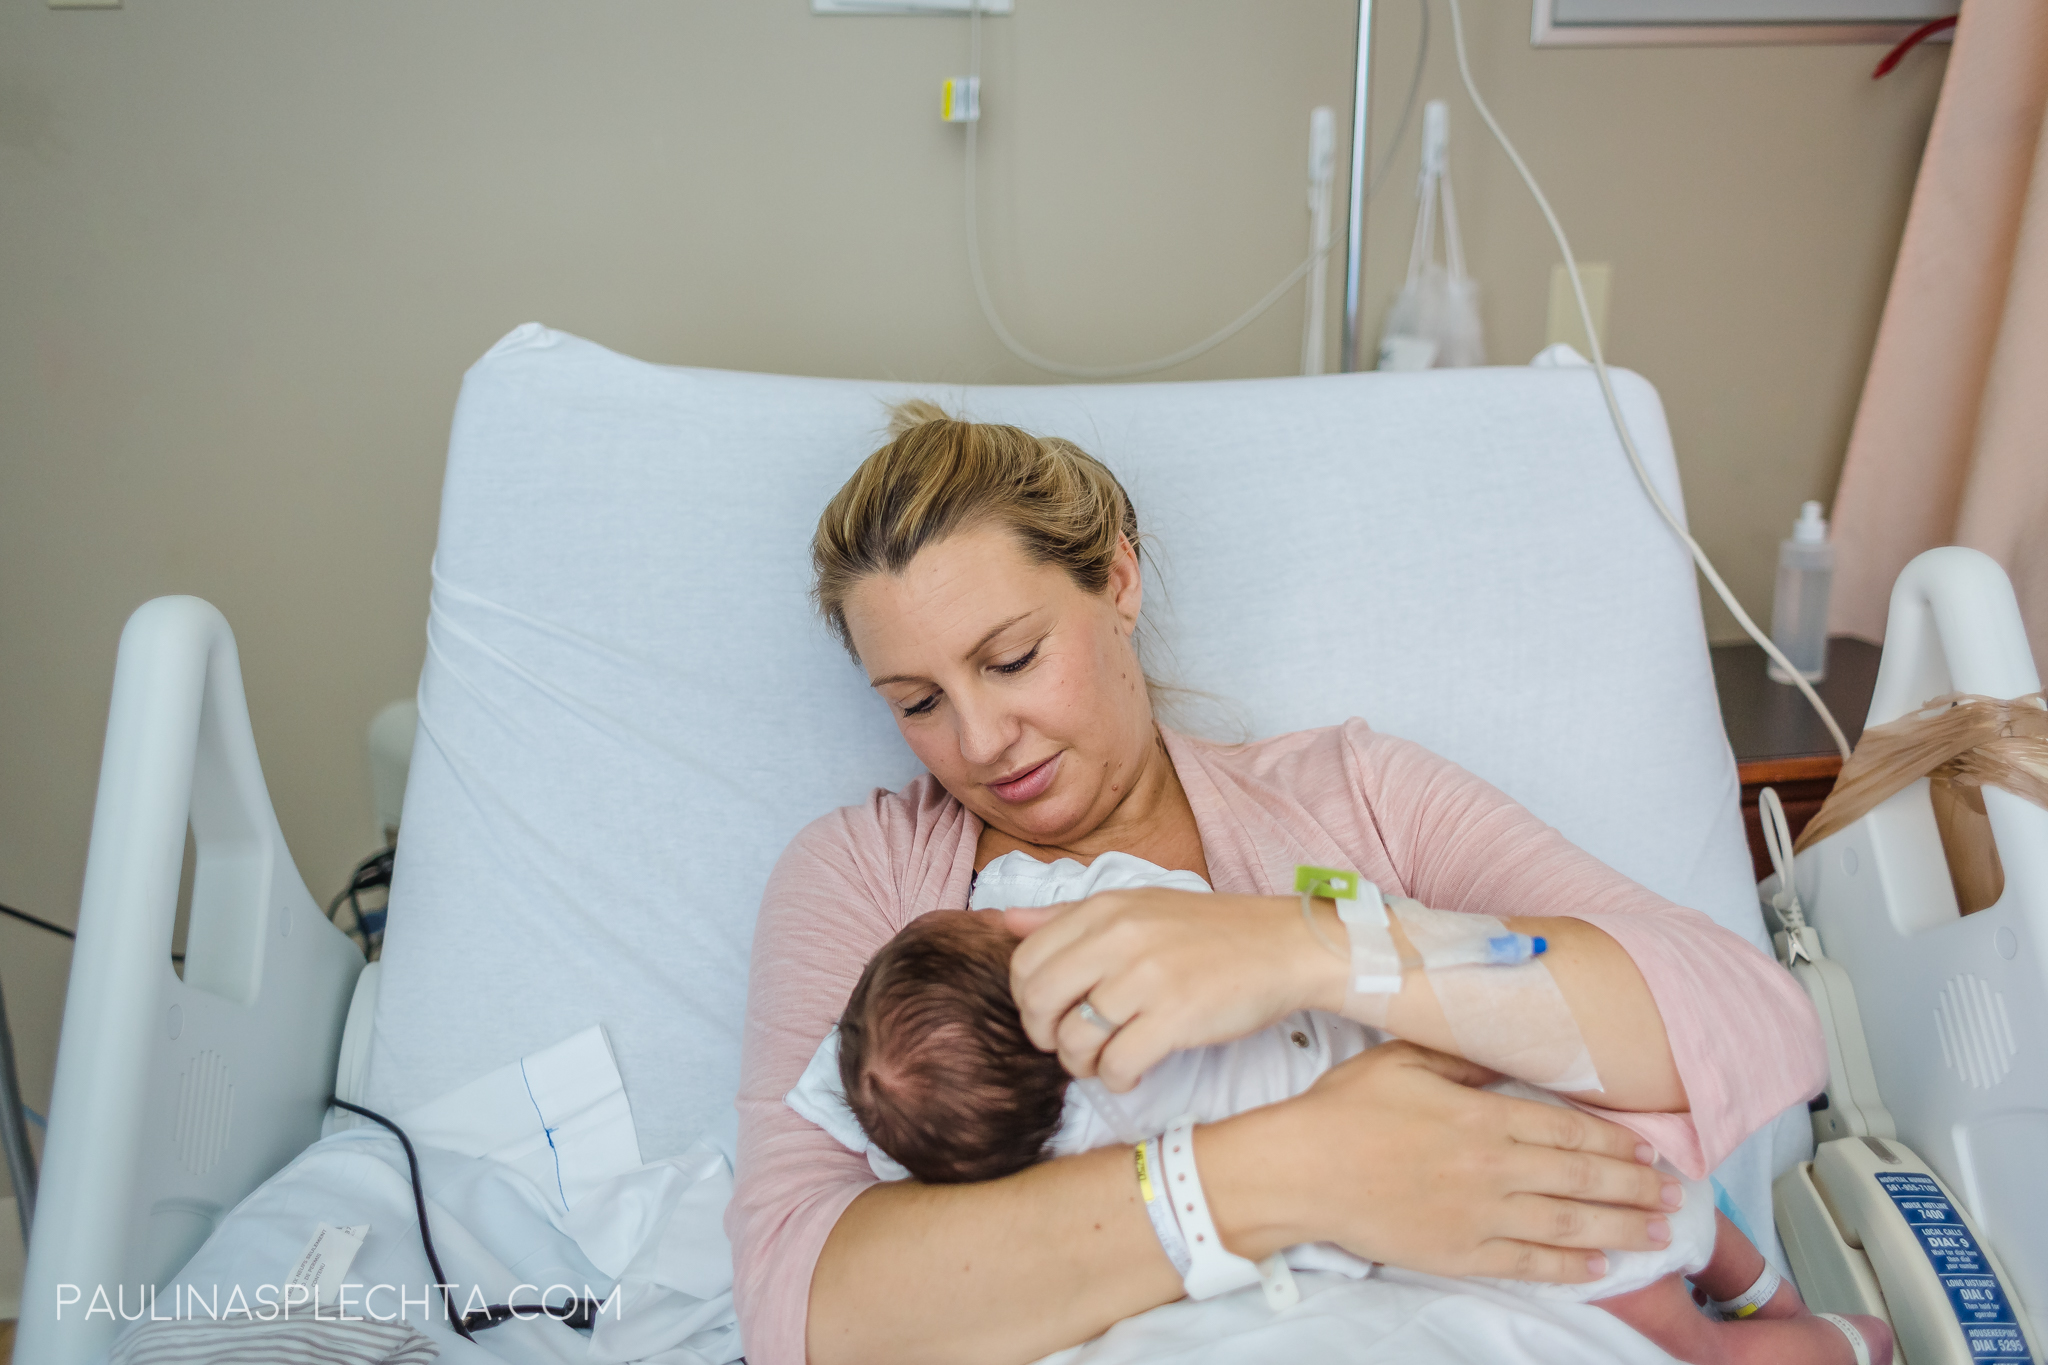 boca-birth-photographer-kathy-fair-courtney-mcmillian-midwife-bocaregional-regional-vaginal-birth-csection-repeat-cesarean-christina-hackshaw-1.jpg